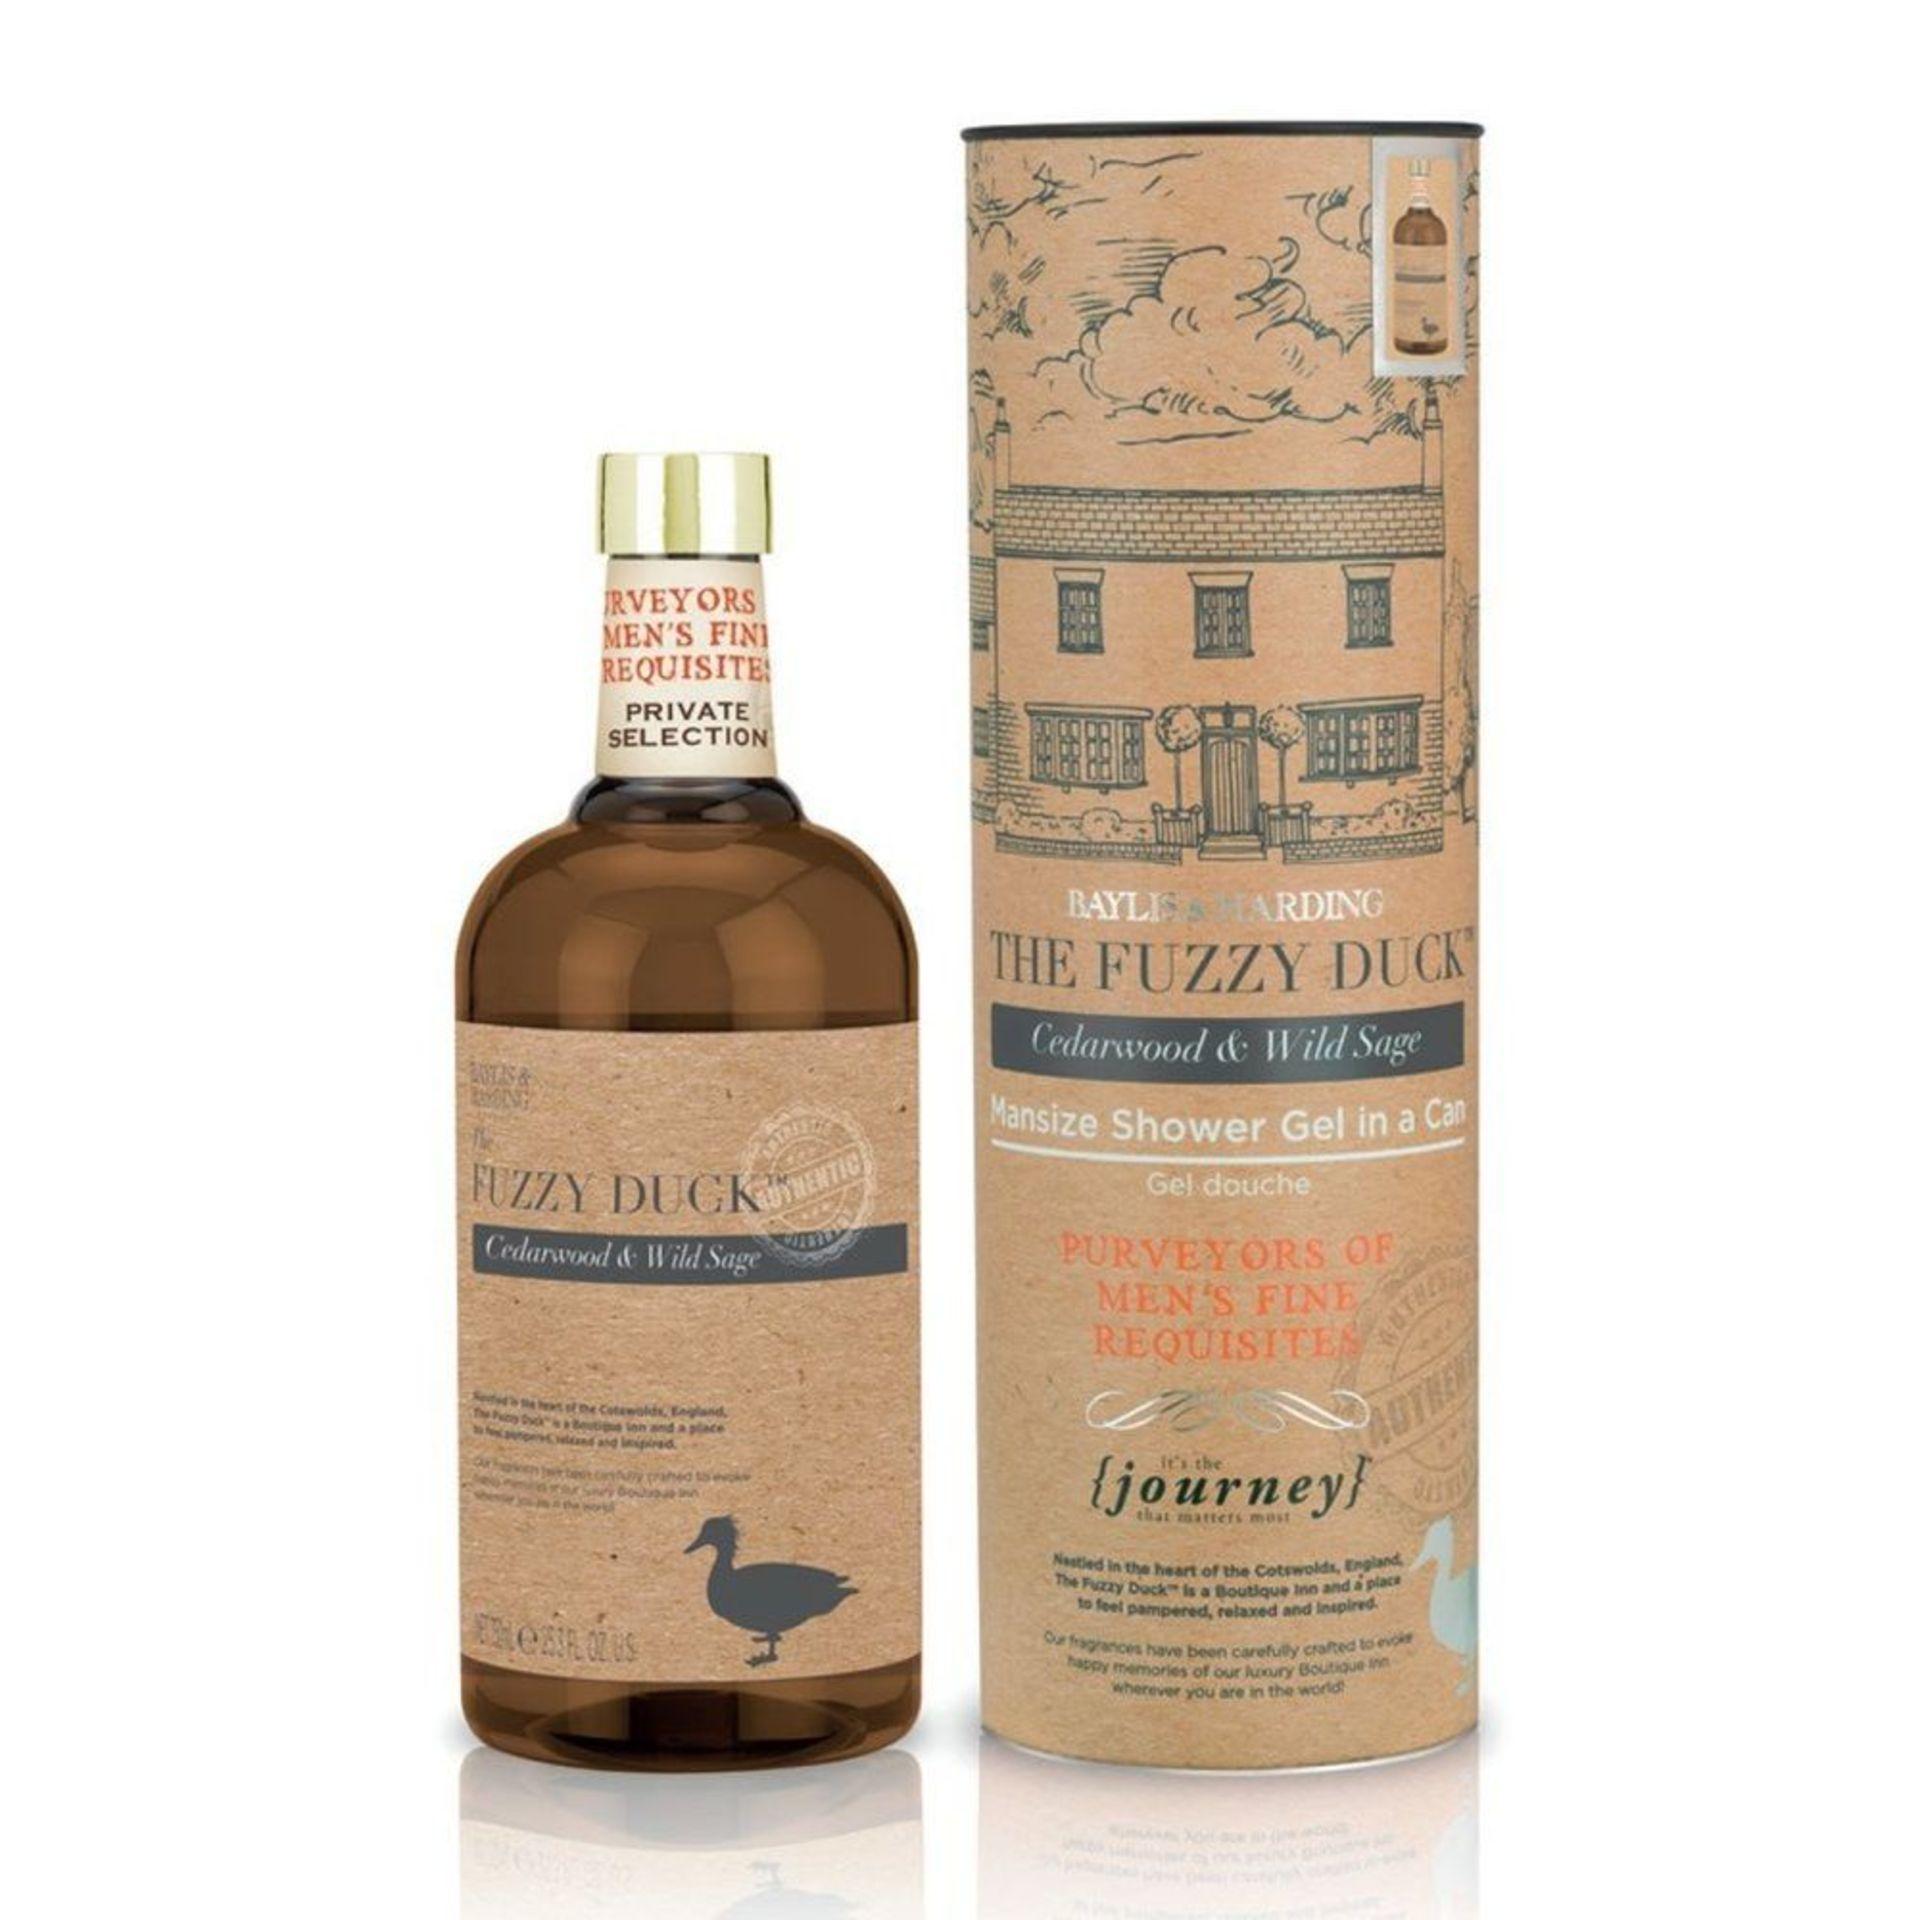 Lot 10053 - V Brand New 750ml Baylis & Harding The Fuzzy Duck Cedarwood & Wild Sage Man-Sized Shower Gel -